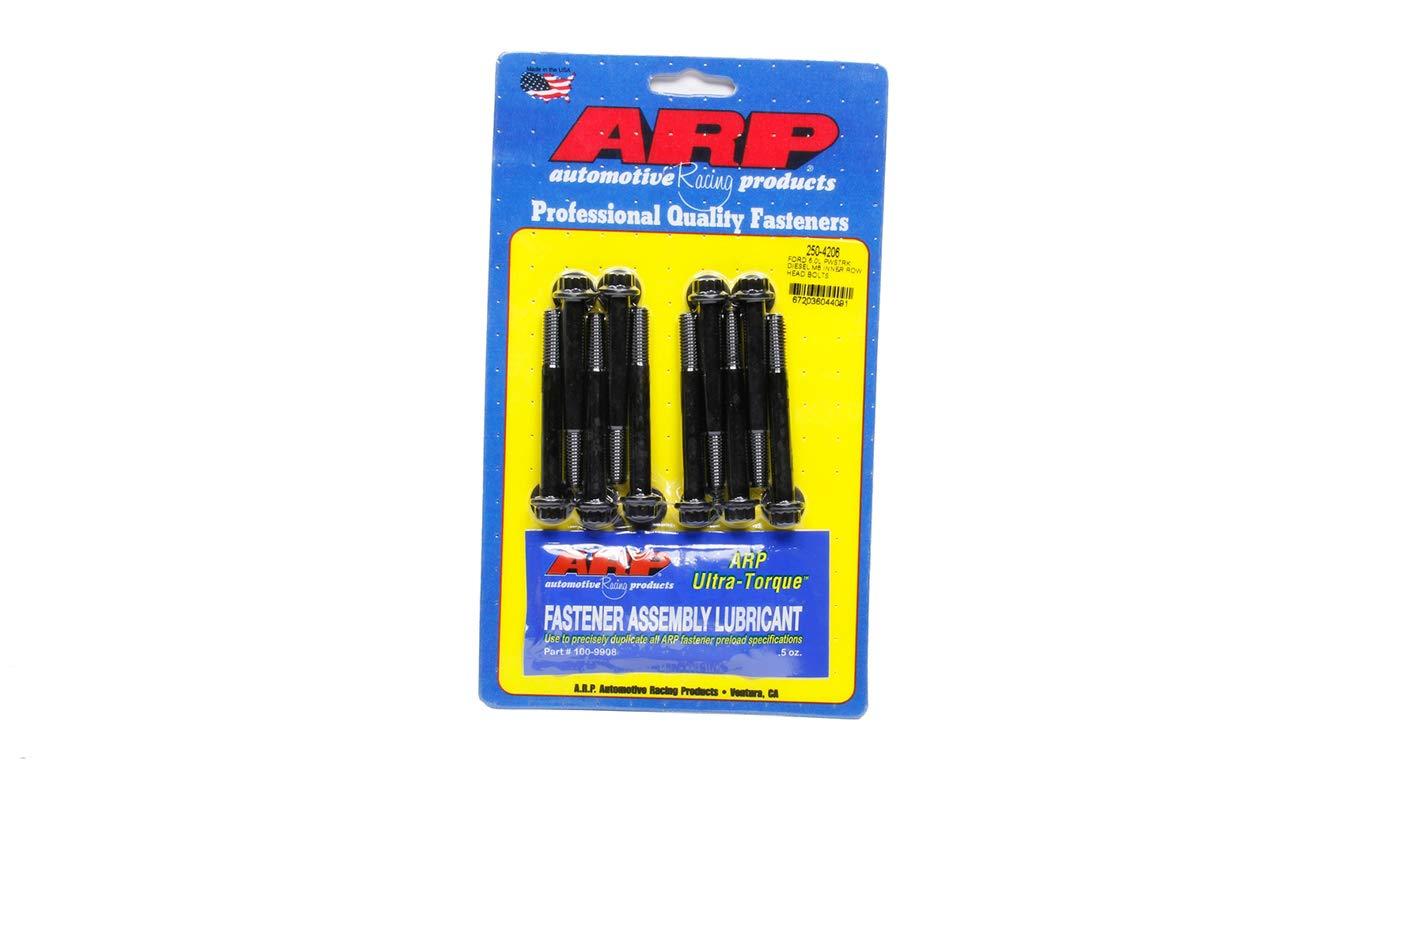 ARP 250-4206 M8 Head Bolt Kit fits Ford 6.0L Powerstroke Diesel